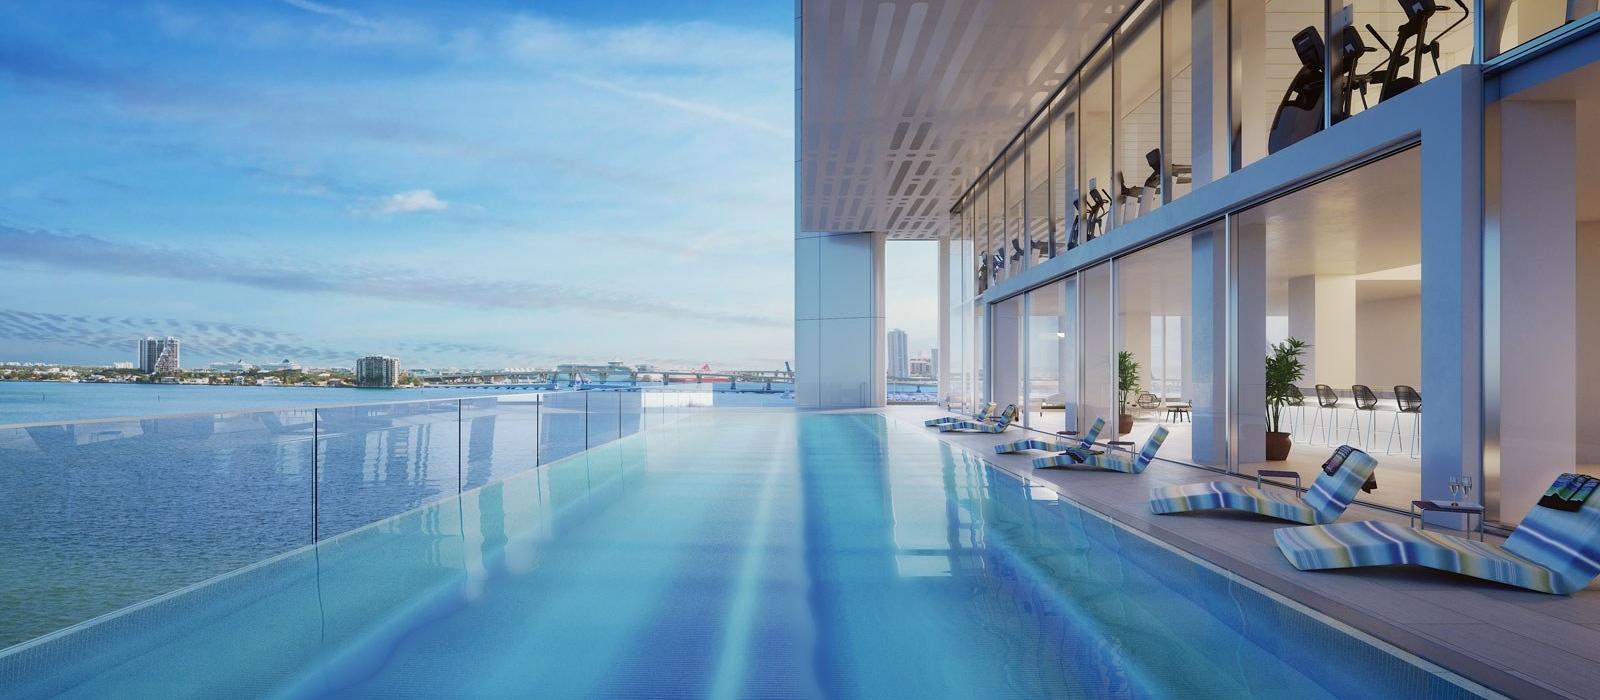 09 Bayside Terrace Infinity Pool Hor